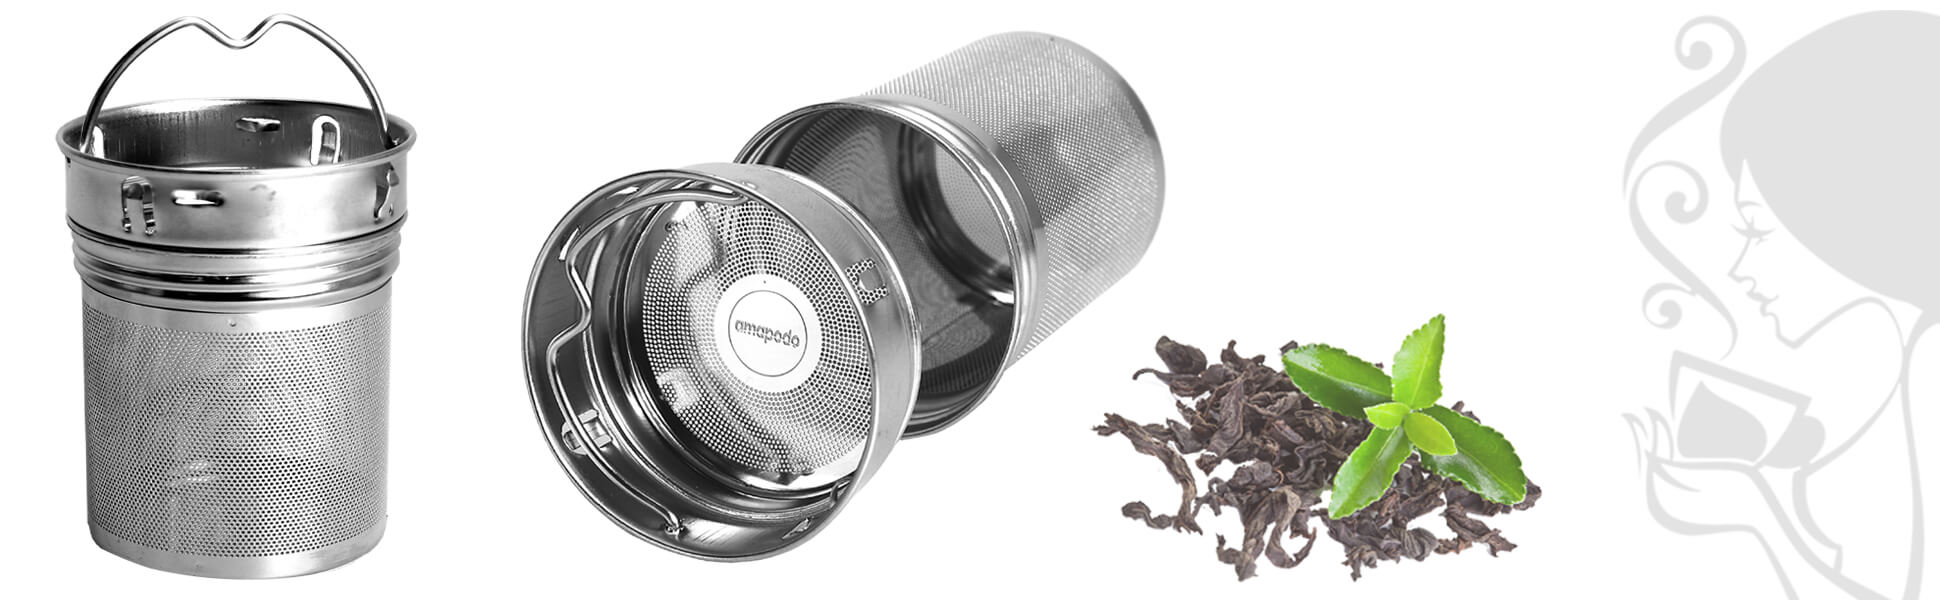 Inoxidable filtros de té